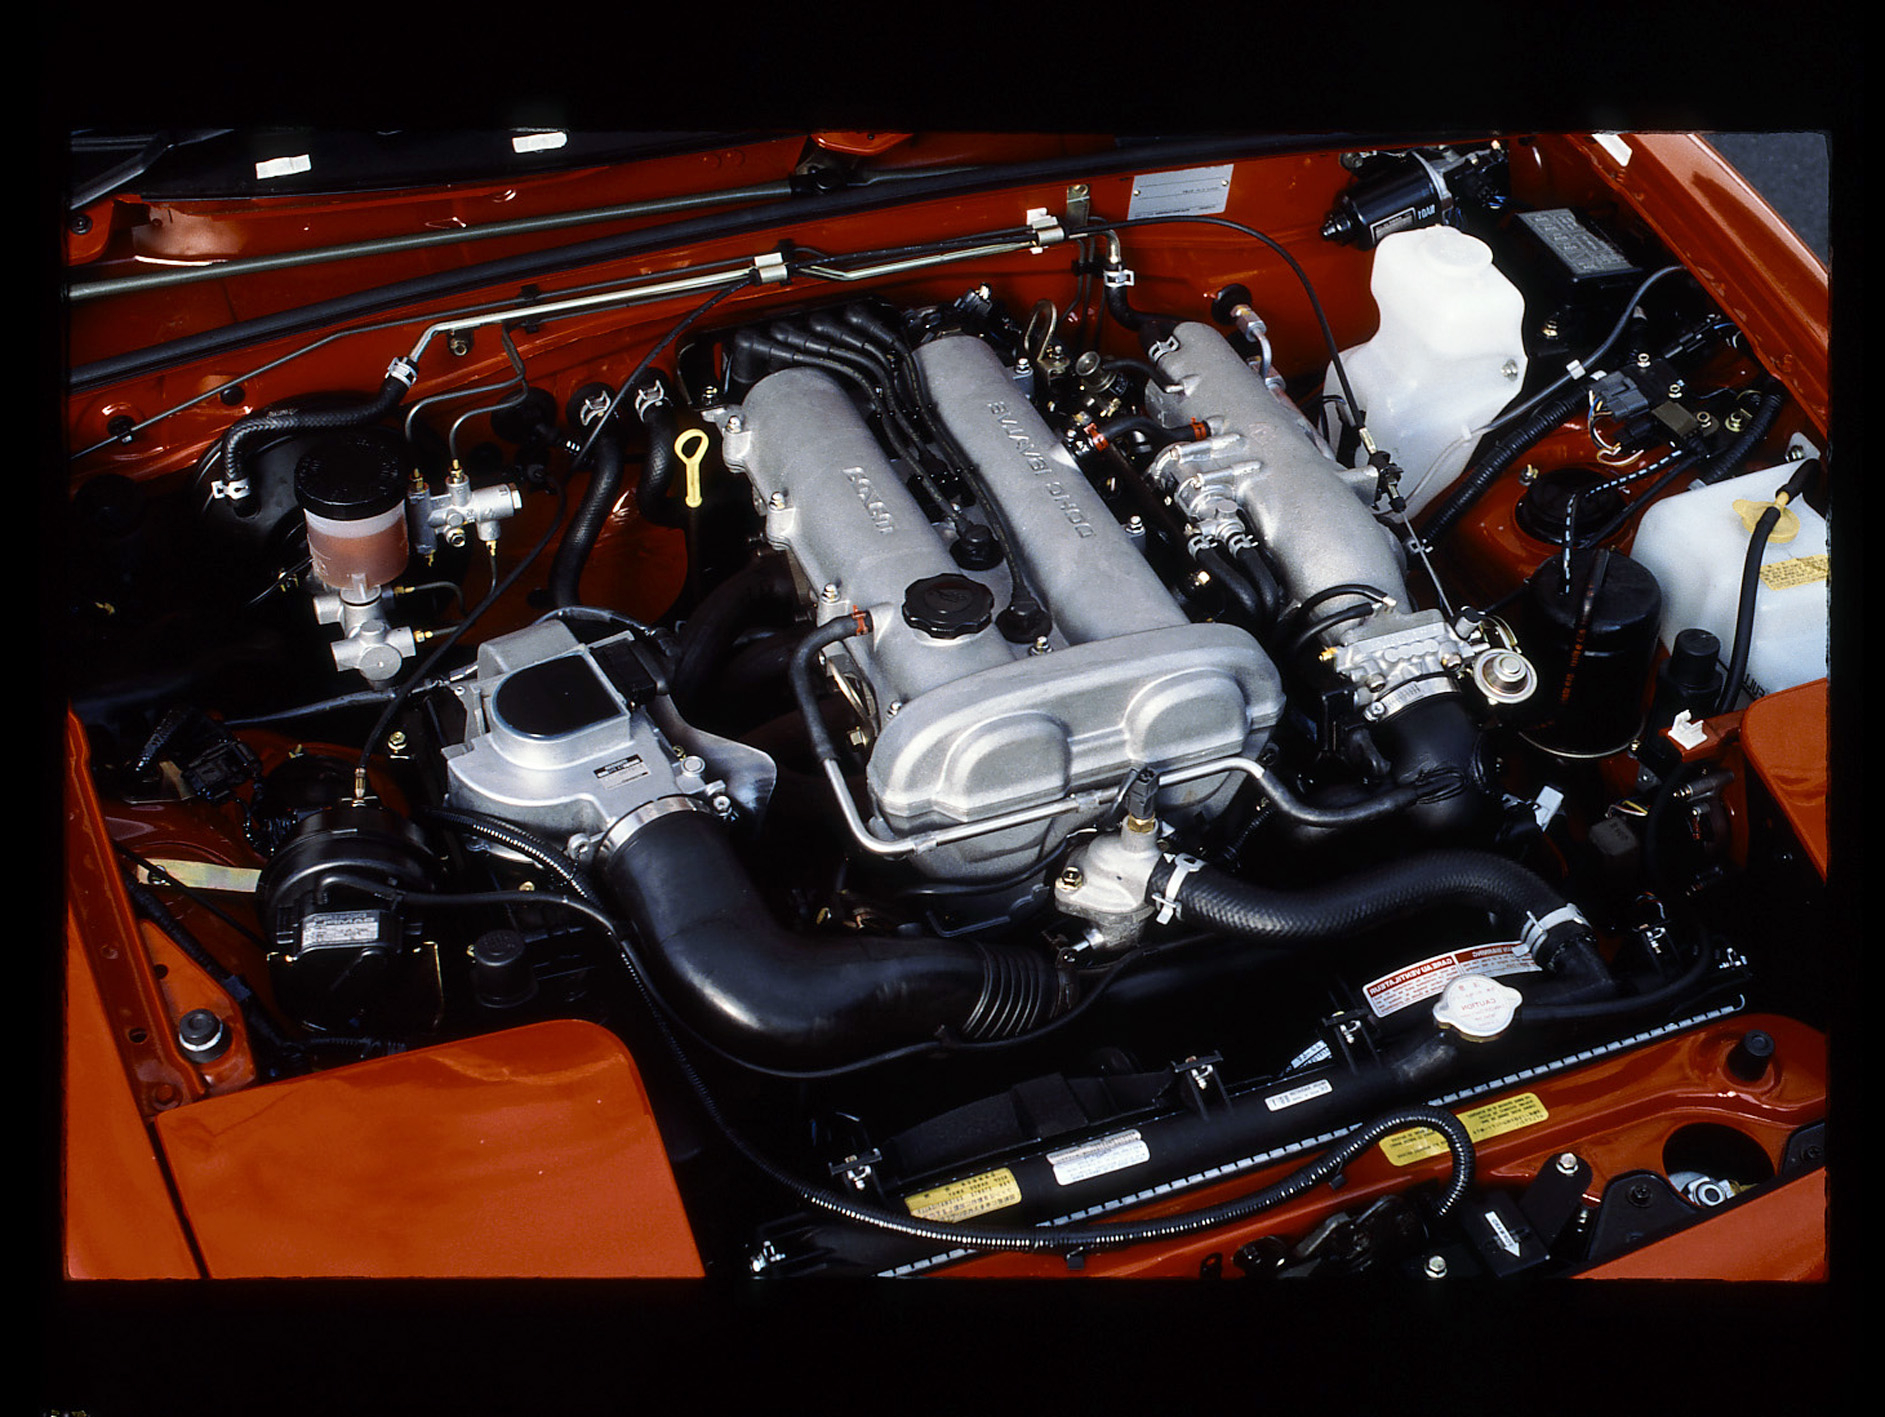 1990 mazda mx5 miata red engine underhood